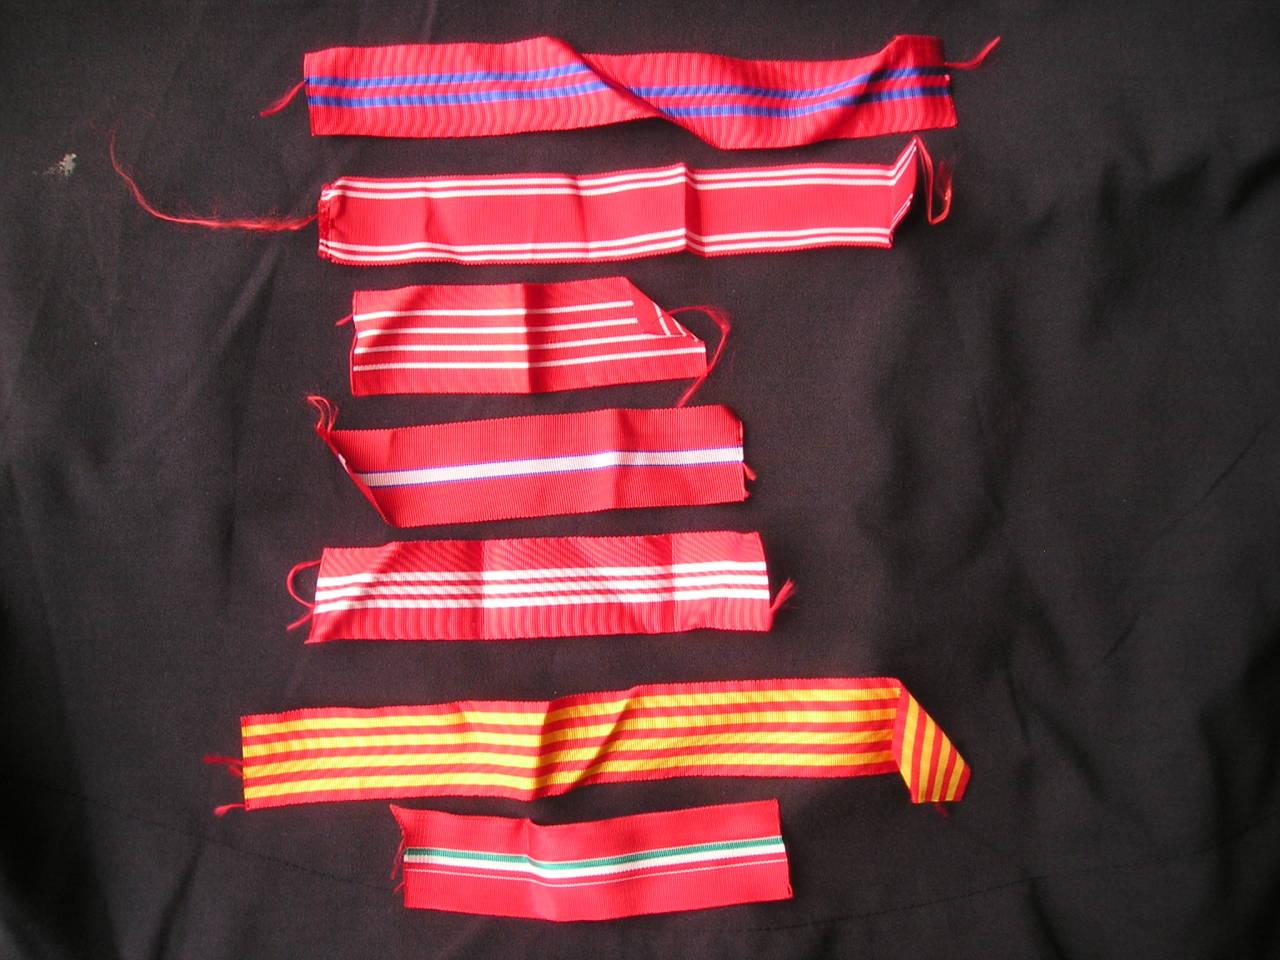 medal order ribbons